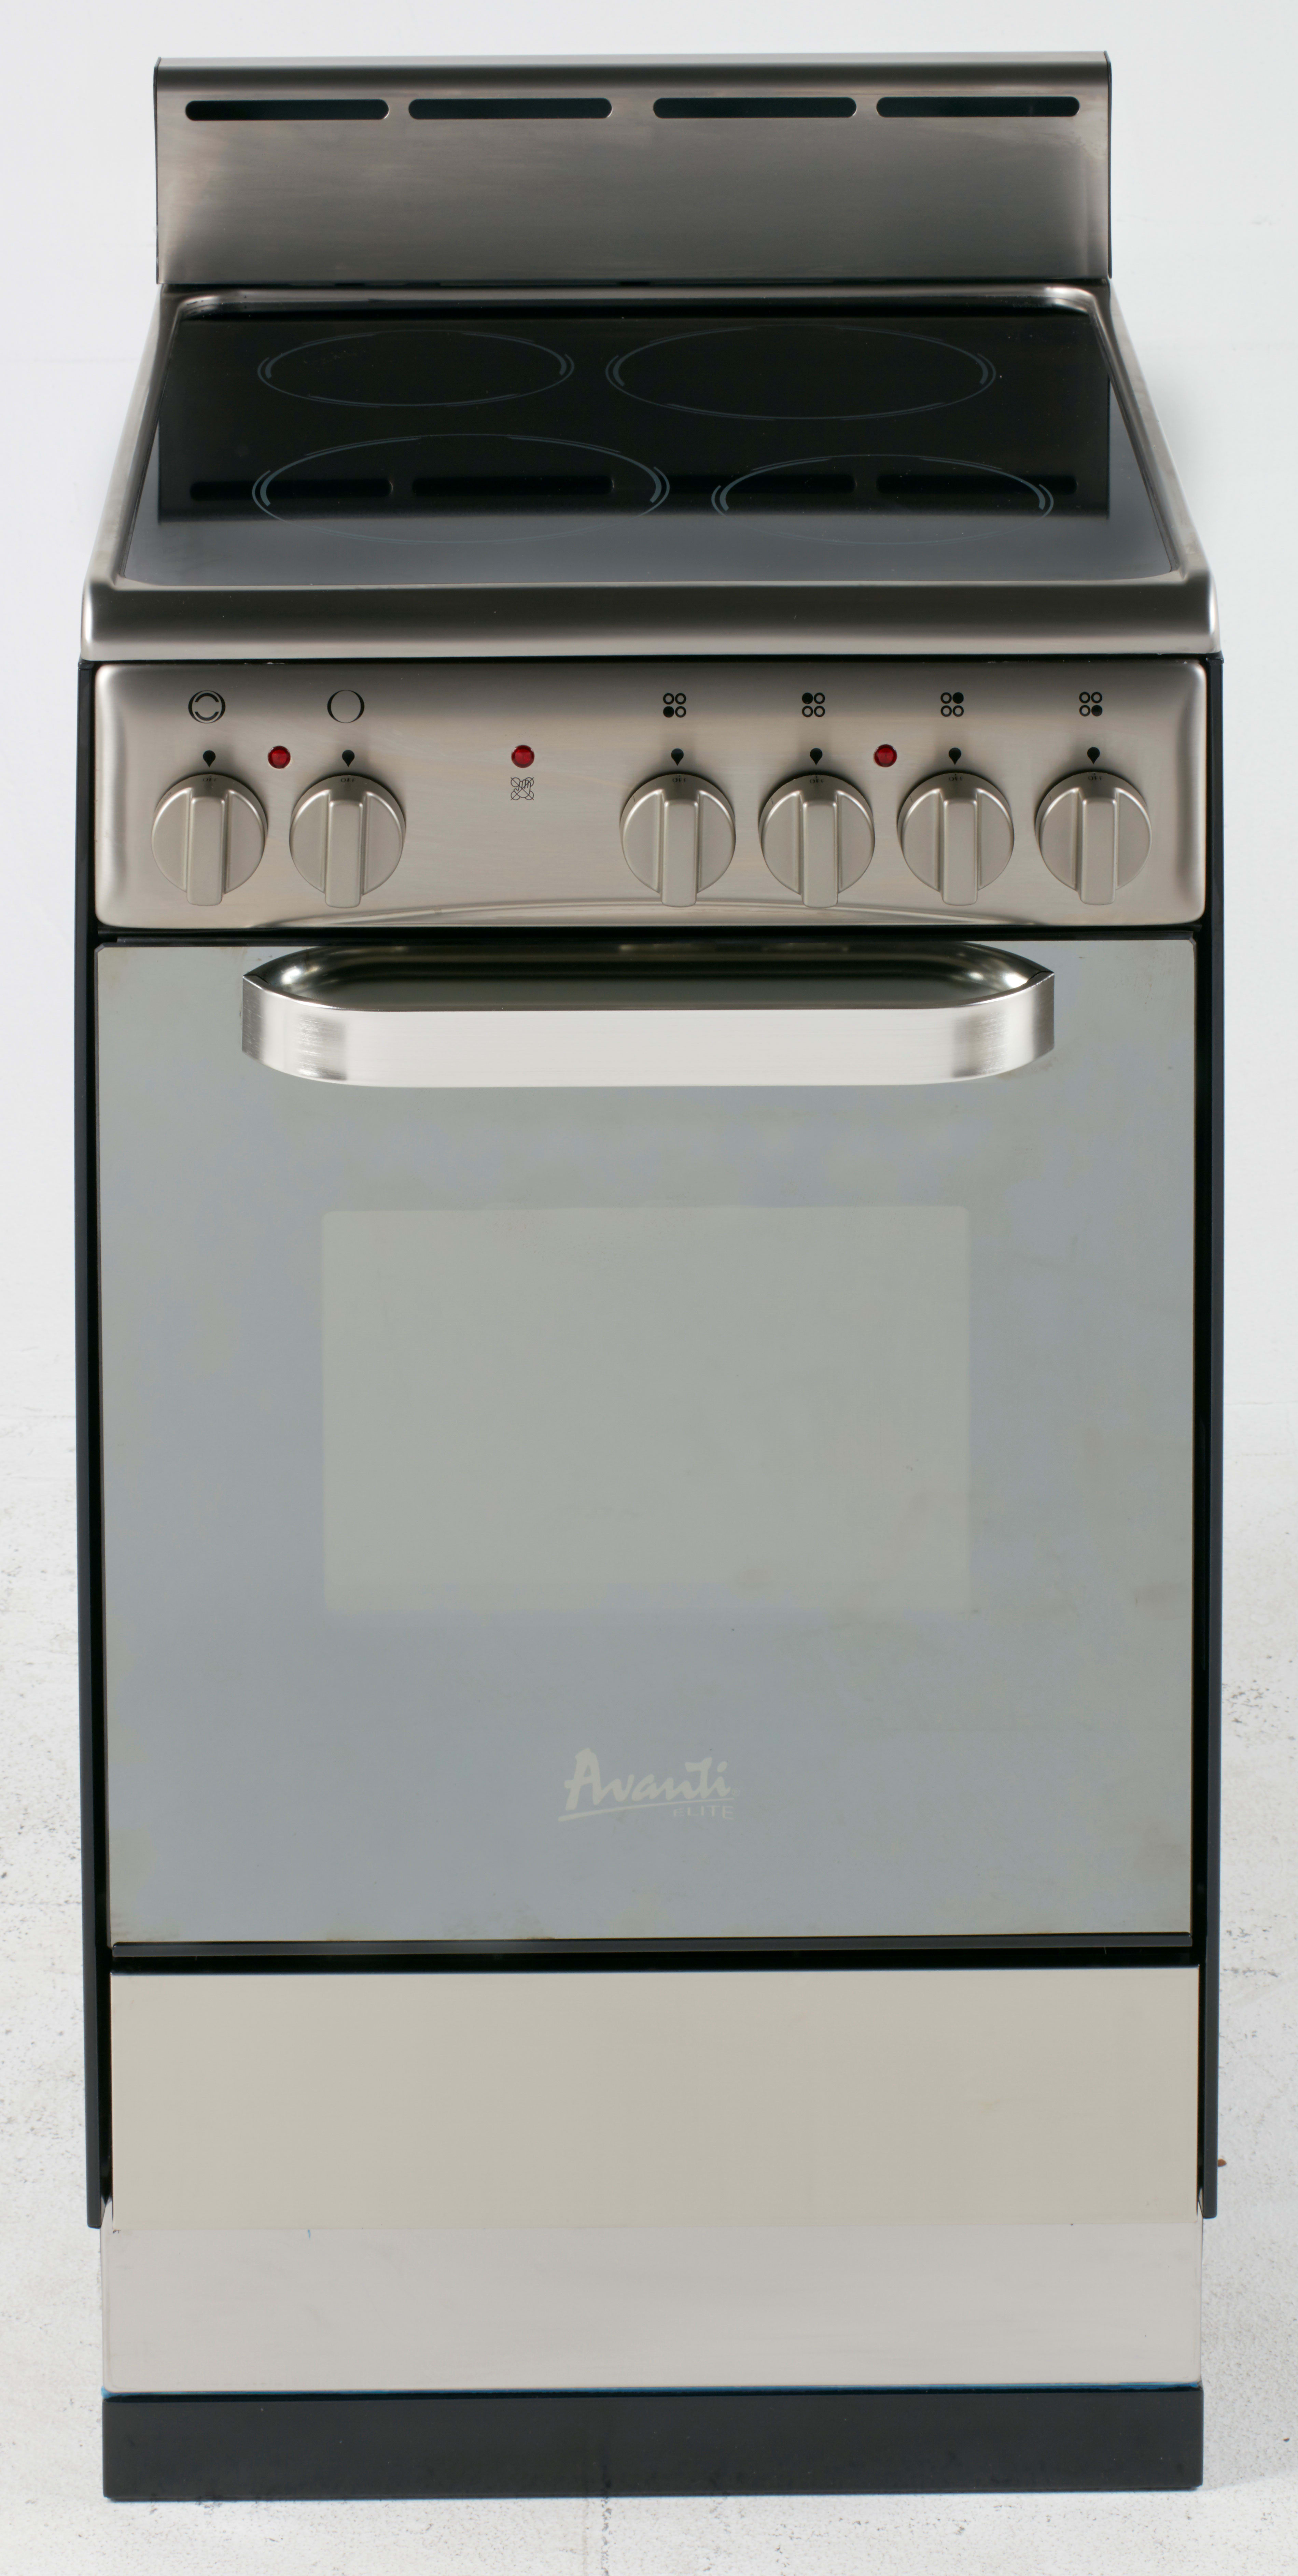 Avanti Der242bs 24 Inch Freestanding Electric Range With 4